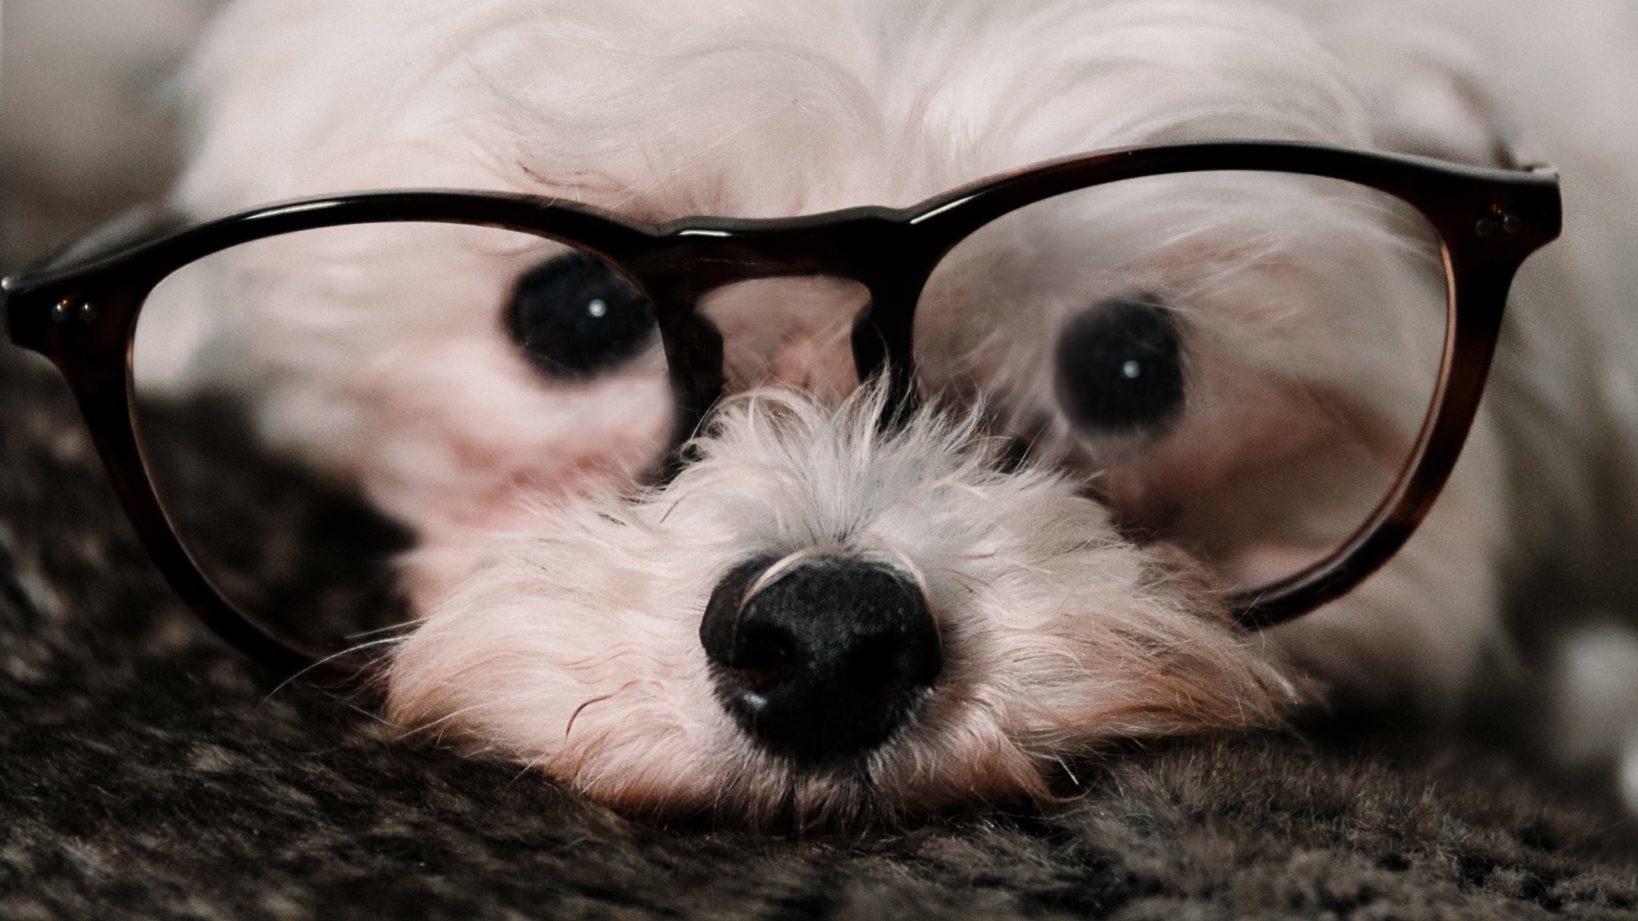 Disease surveillance in pets, dog wearing glasses